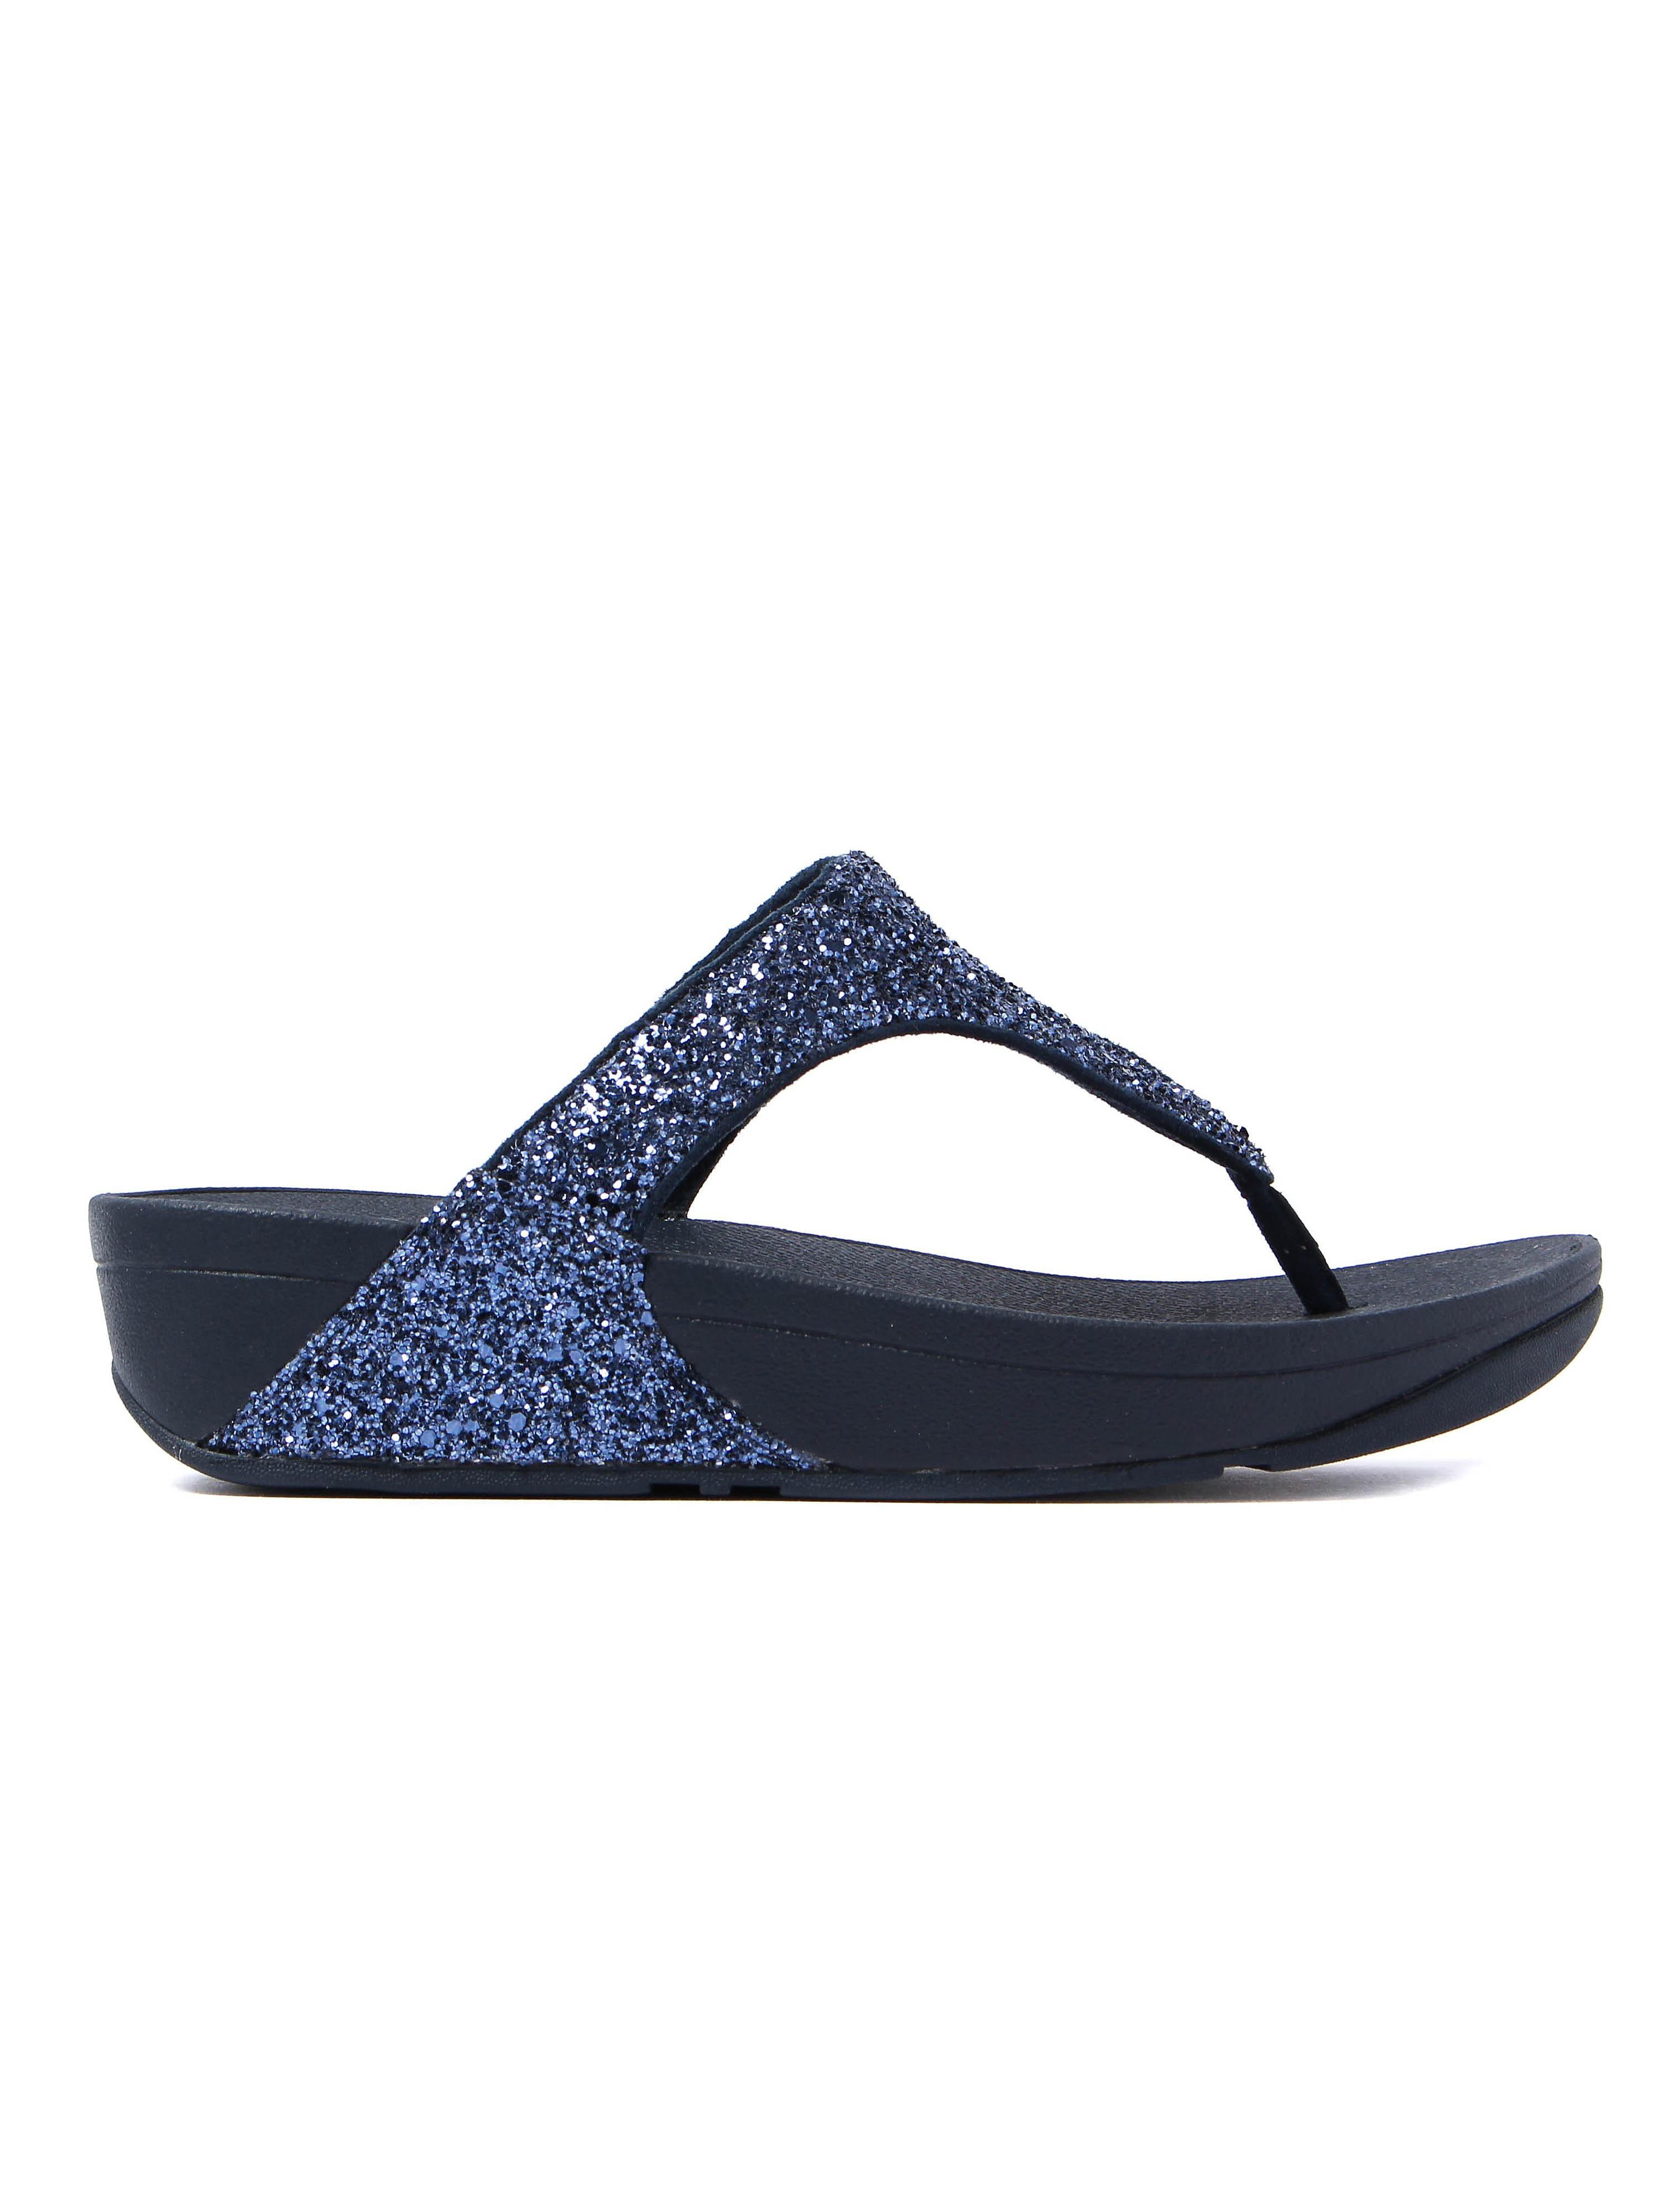 FitFlop Women's Glitterball Toe-Post Sandals - Midnight Navy